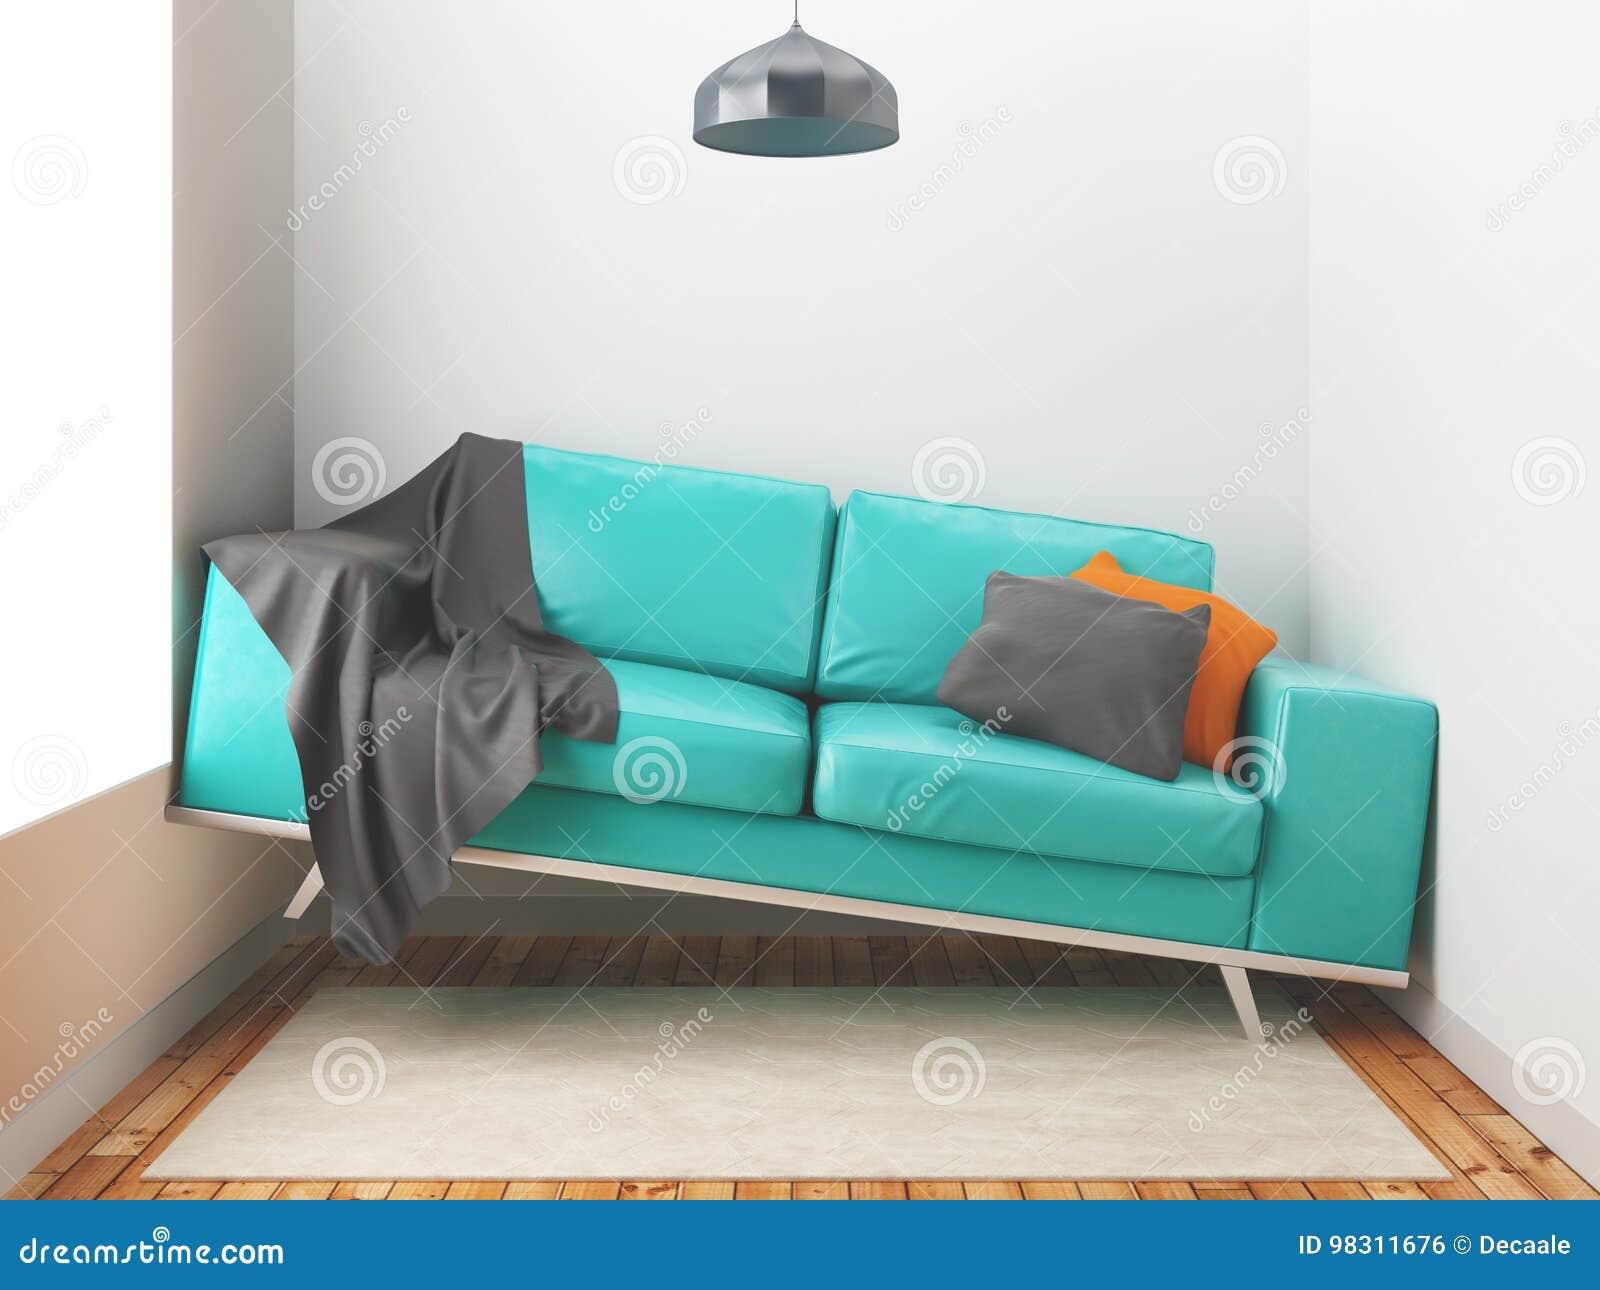 Awry sofa, big sofa in a small room, 3d render illustration